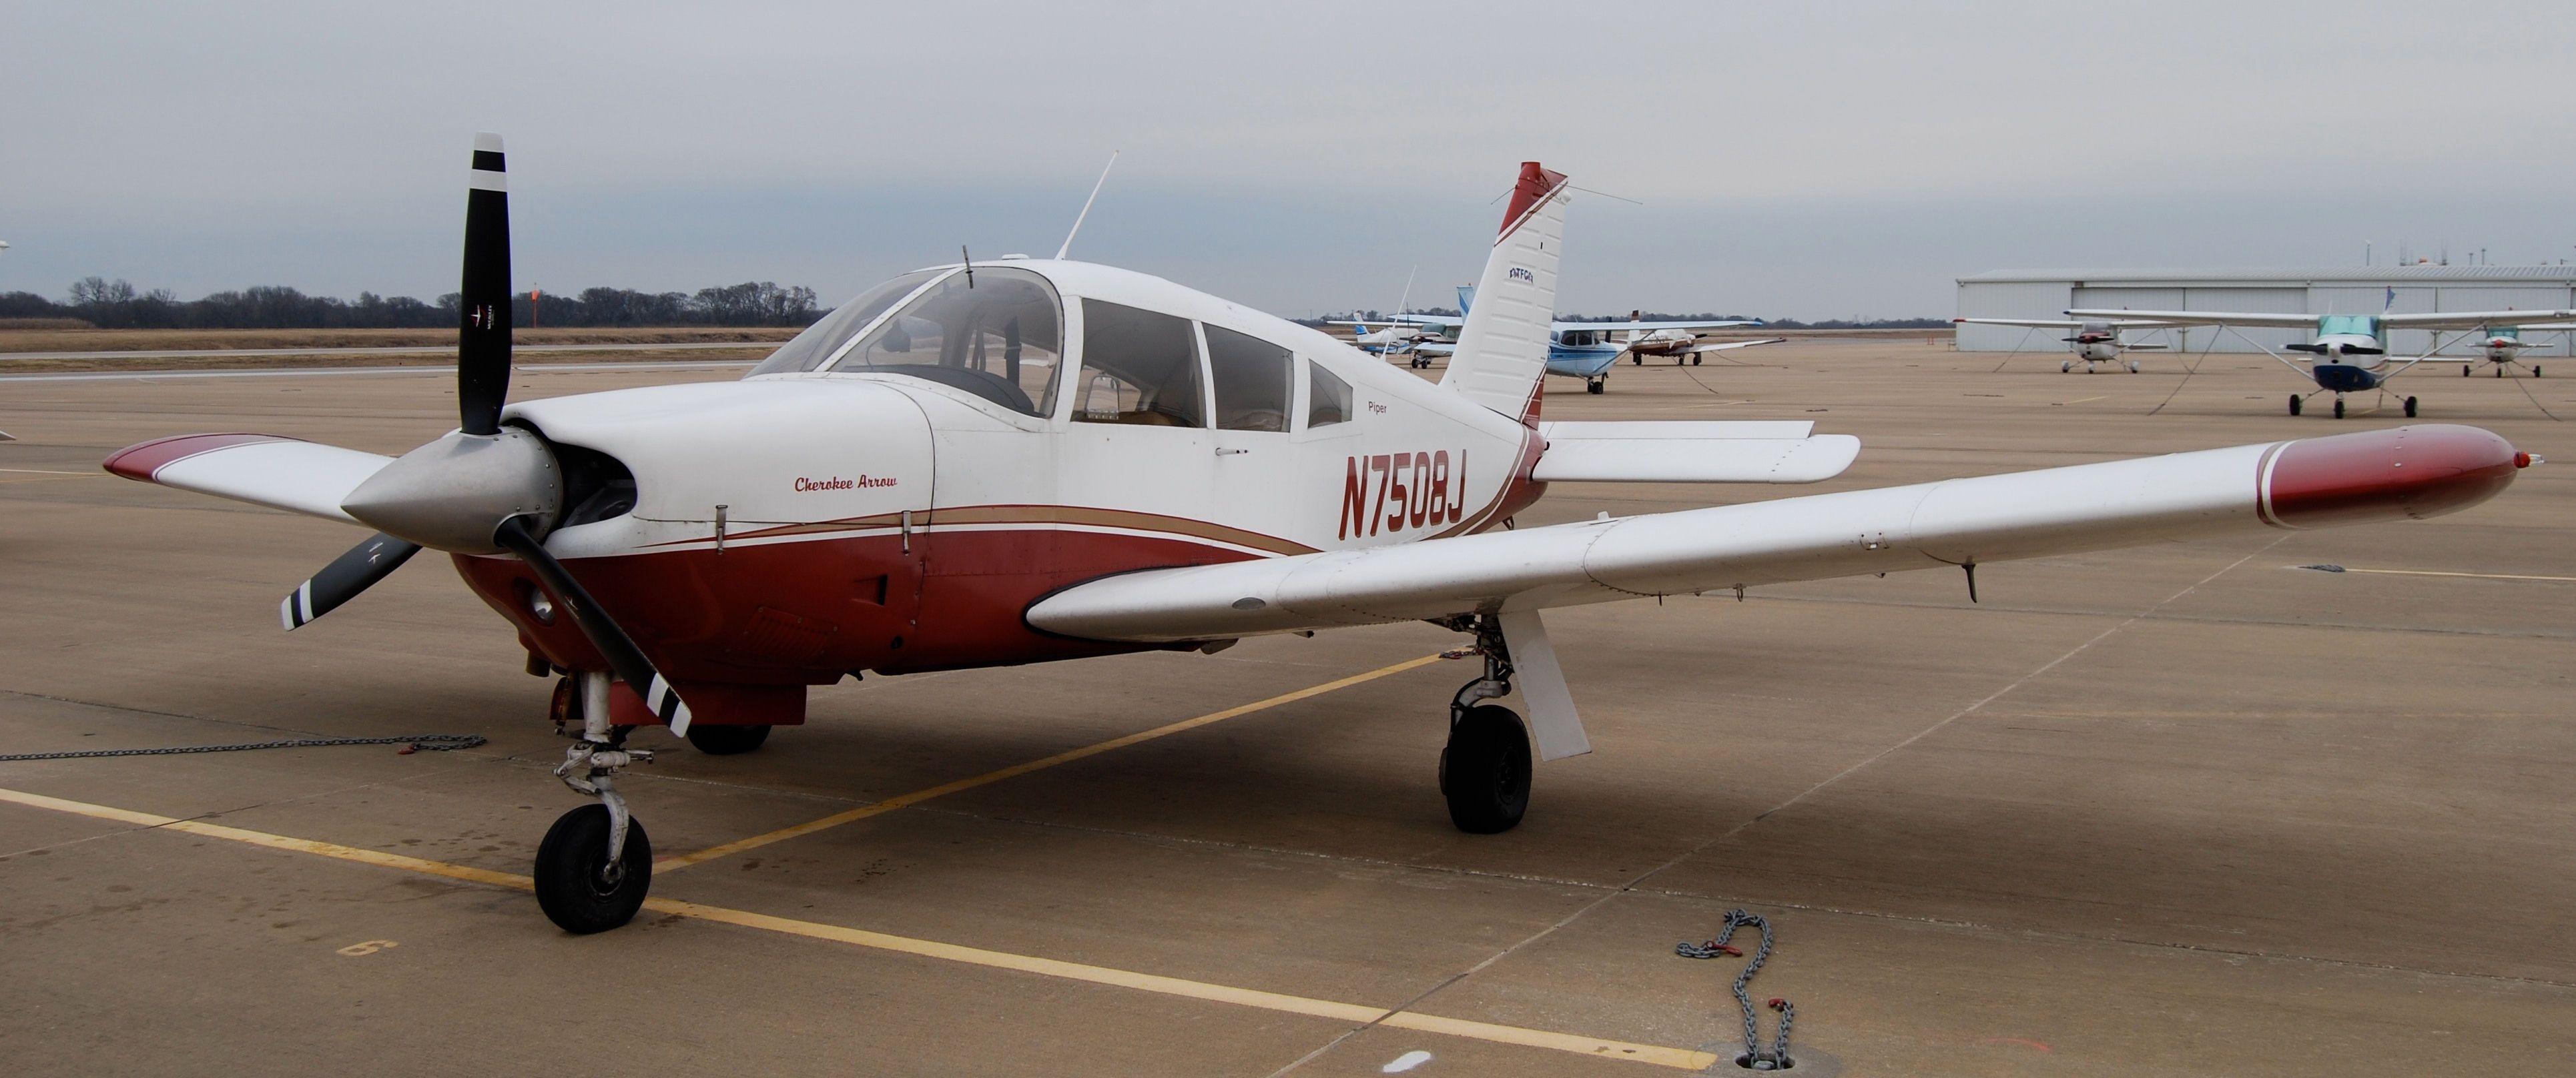 Aircraft Info Aircraft, Private pilot license, Private pilot